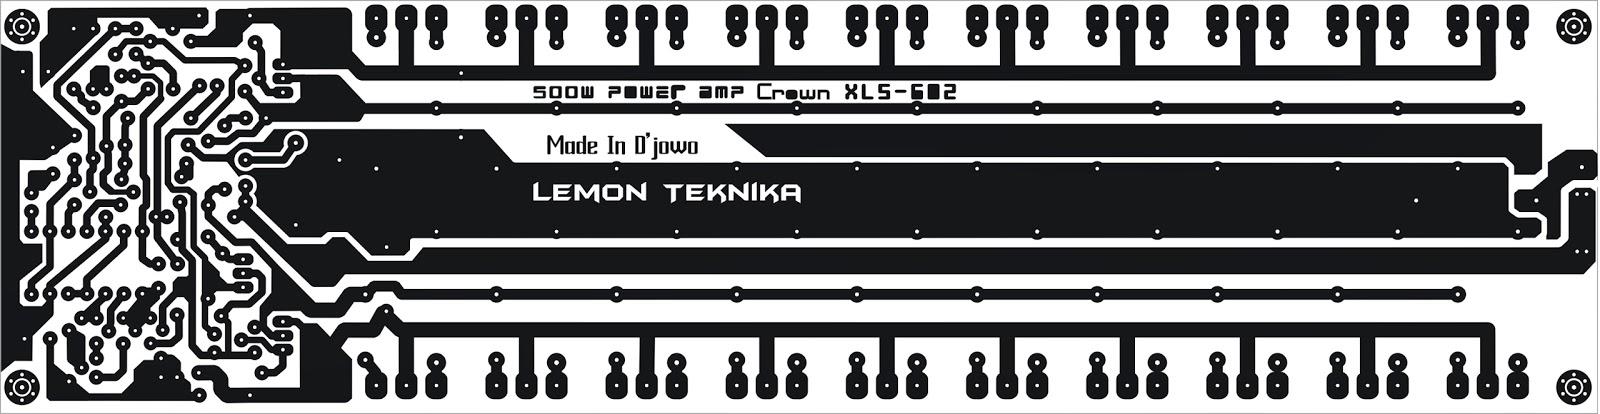 skema ampli apex